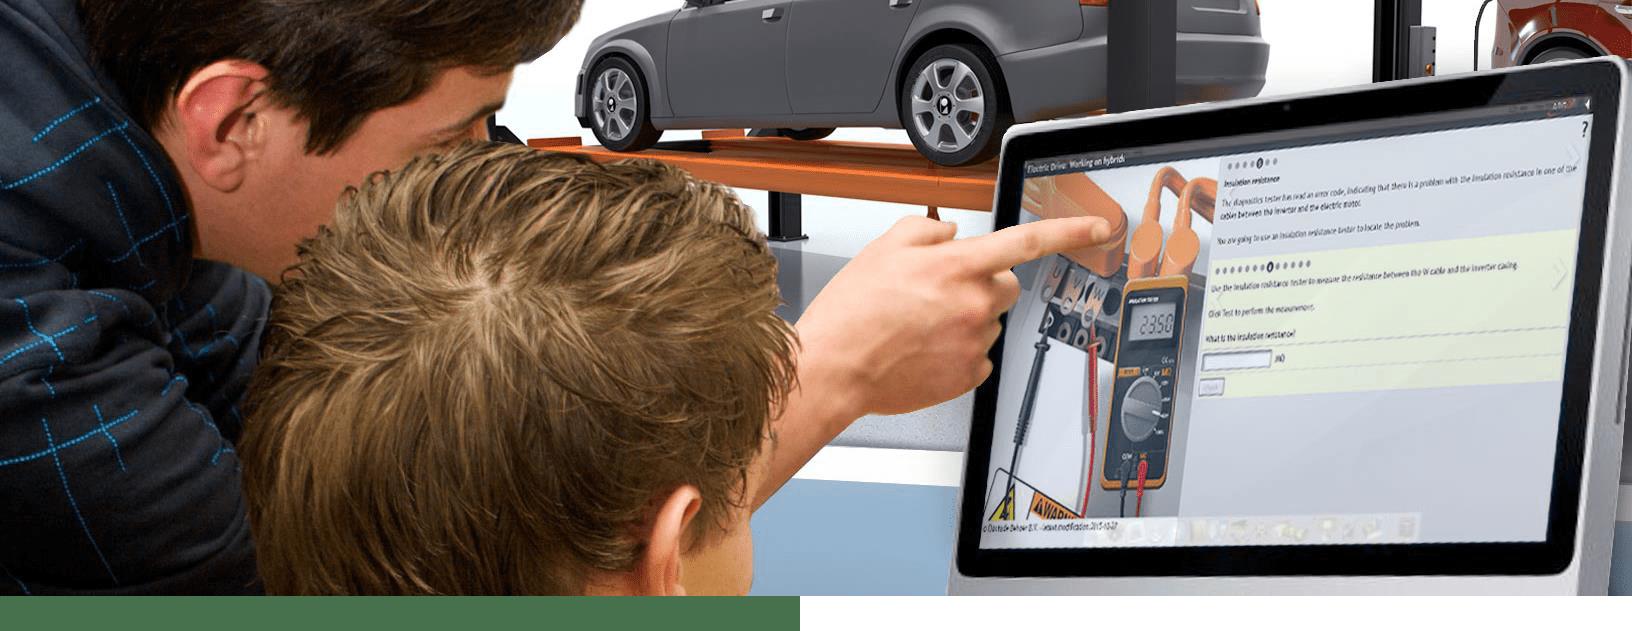 дистанционный курс авто-электриков